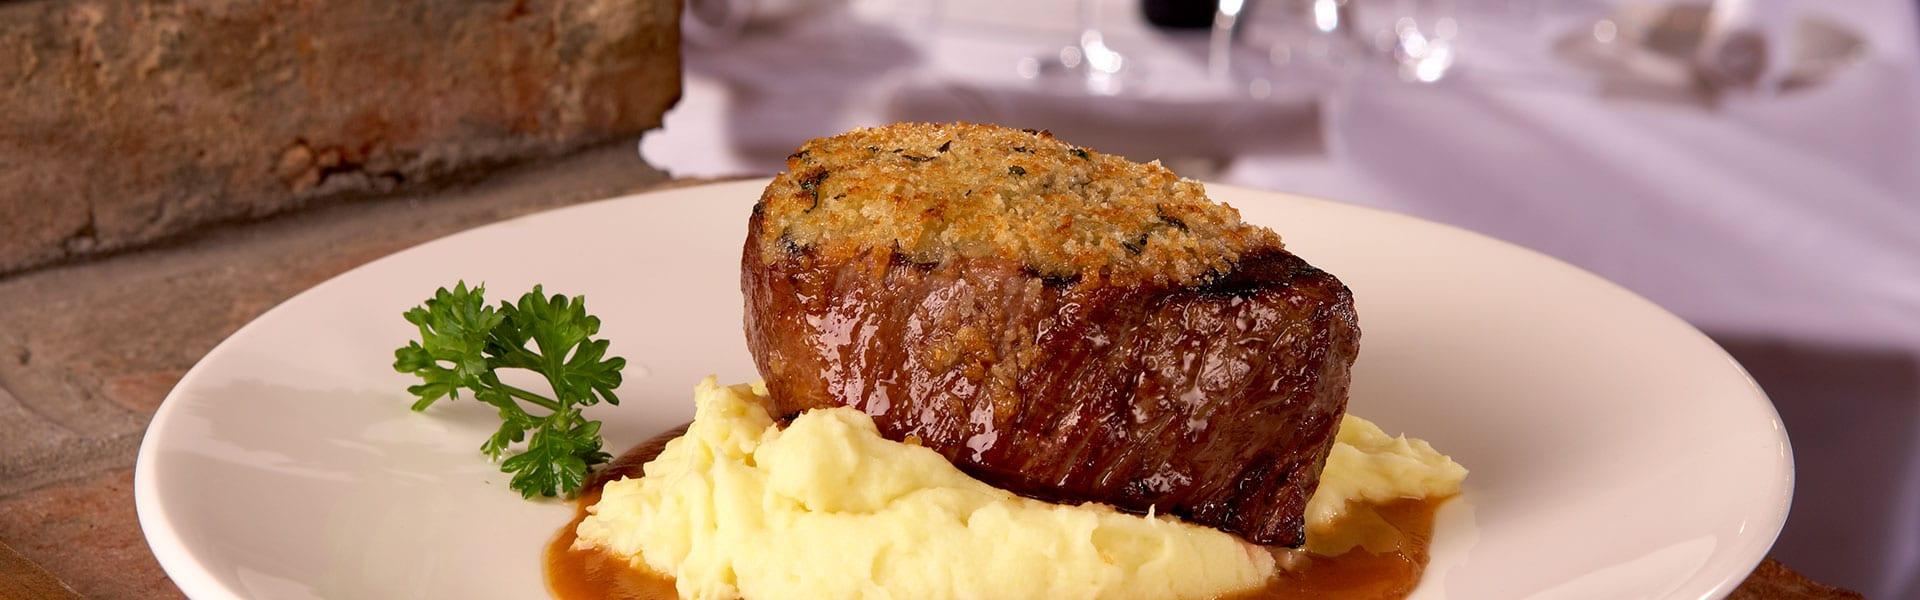 Dinner Menu - Ken's Steak House